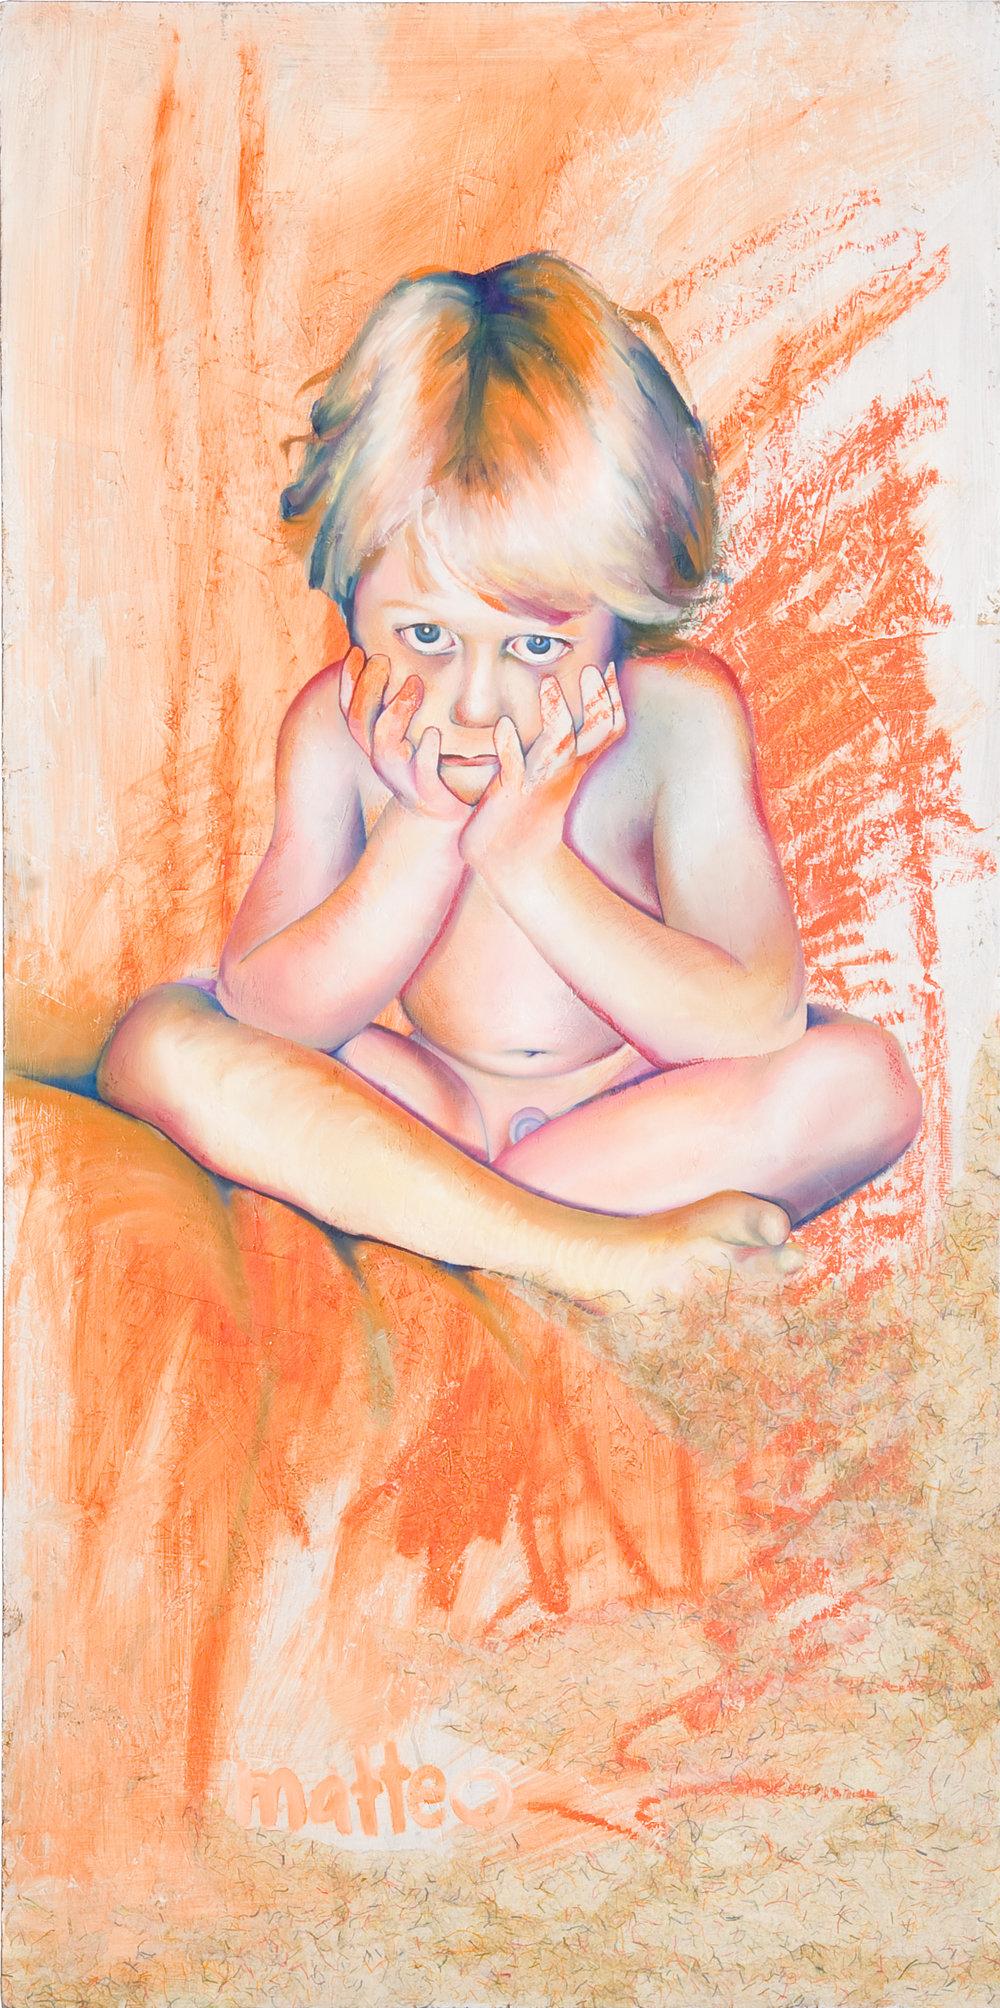 Orange Matteo